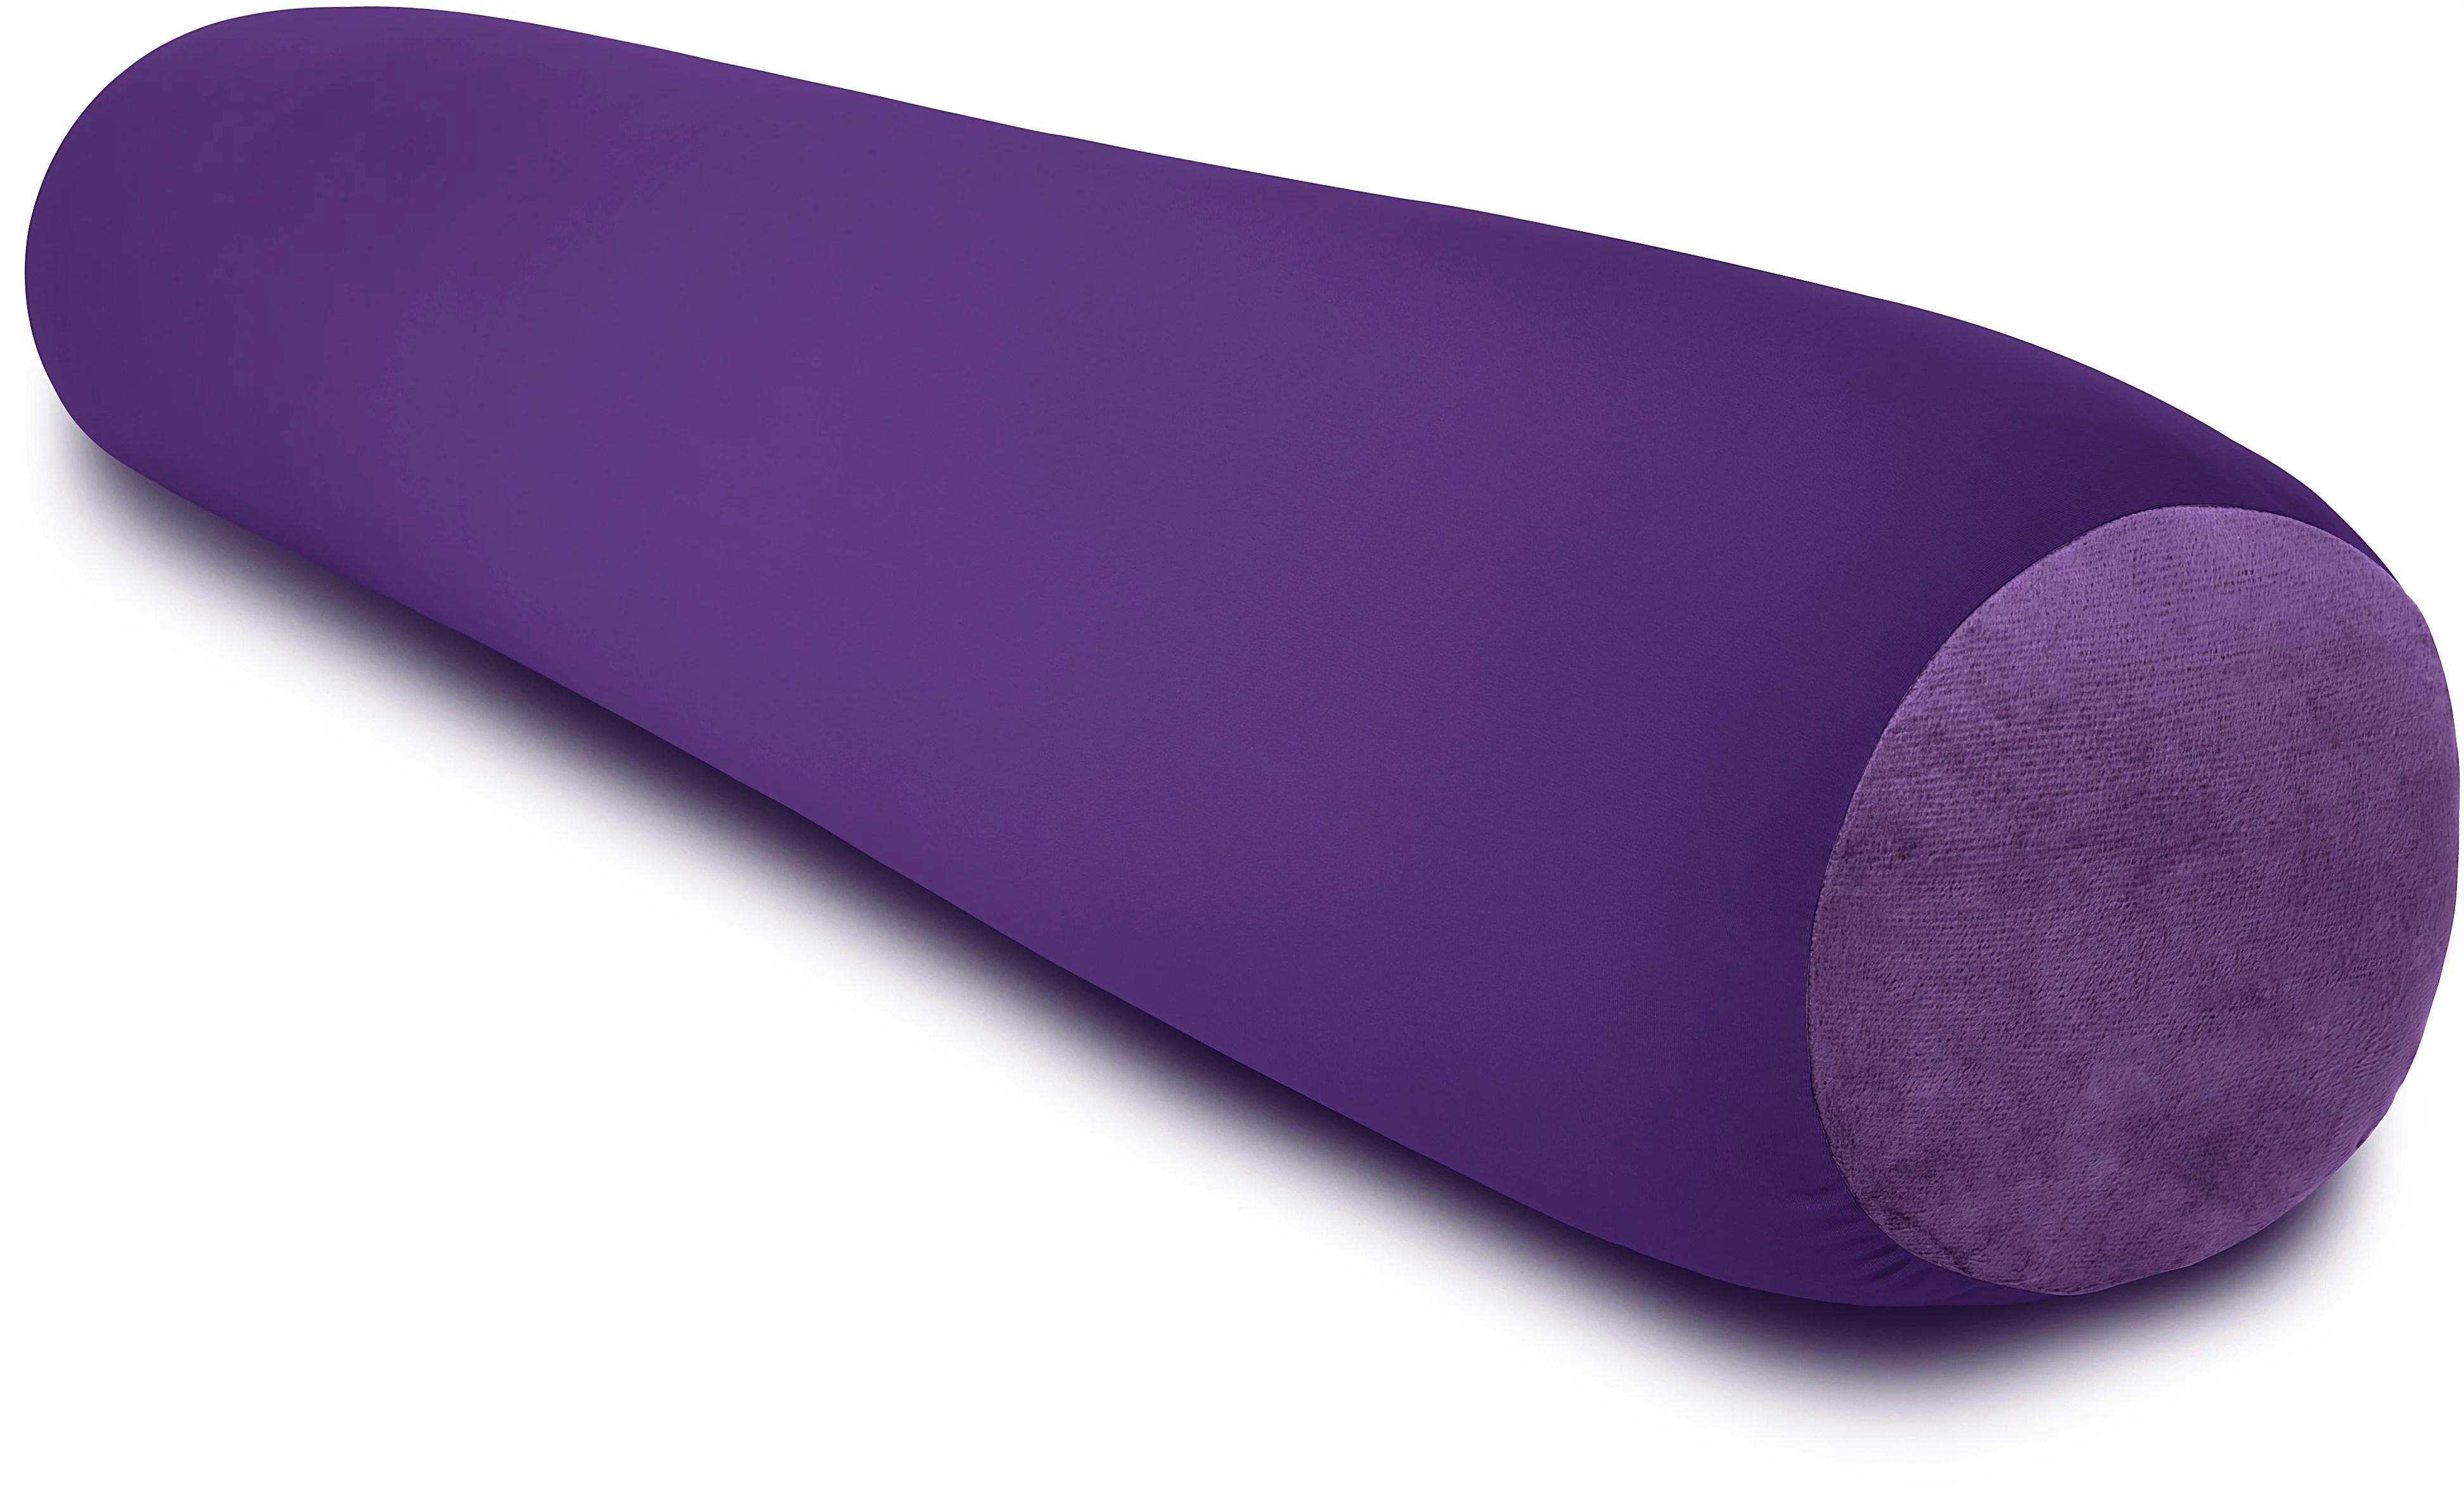 mooshi squishy microbead body pillow hypoallergenic bean bag pillow fun bubbly colors body pillow purple